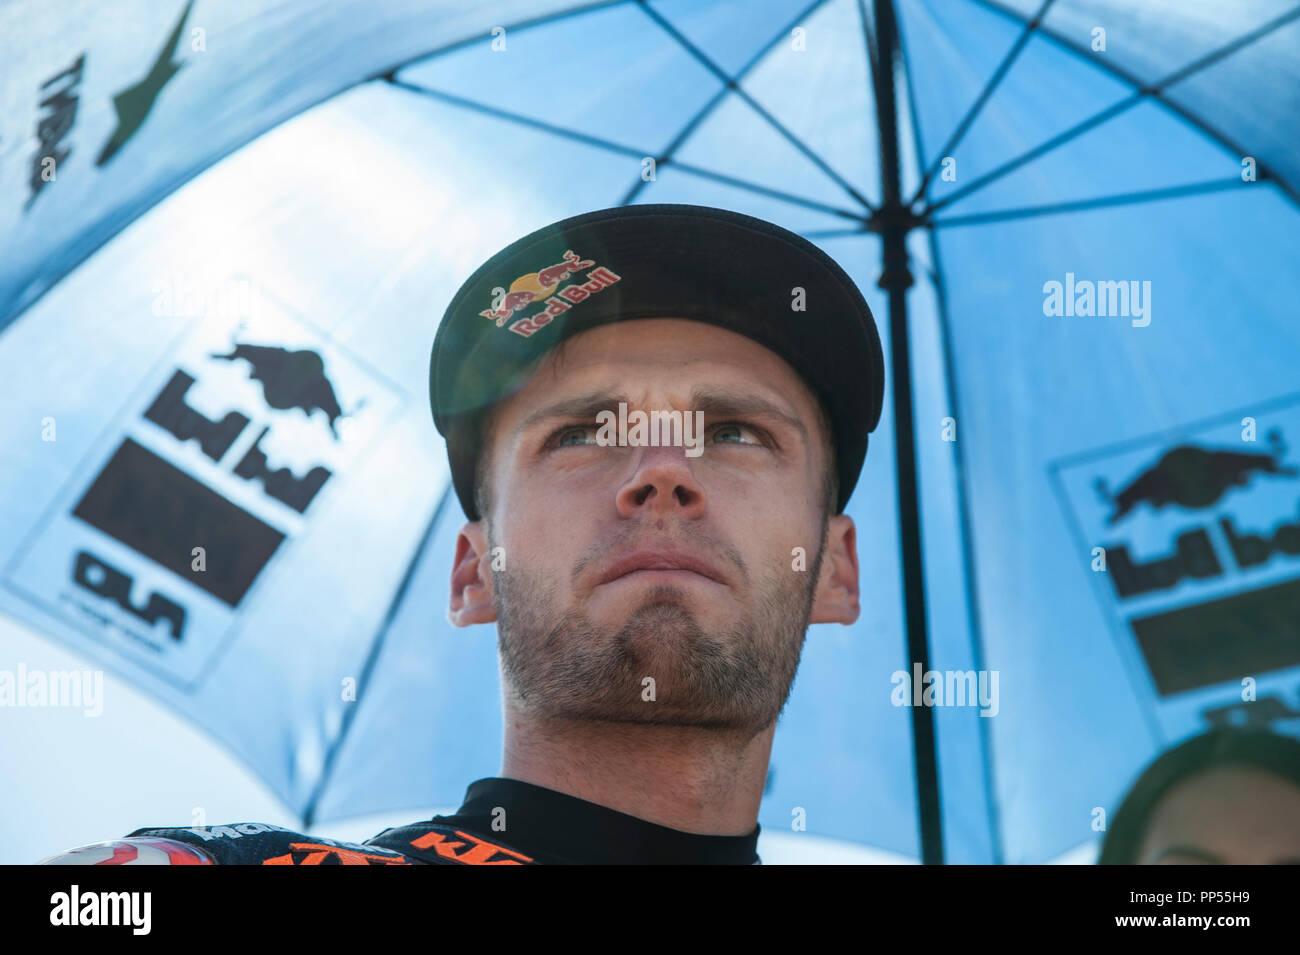 Alcaniz, Spain. 23rd September 2018. Motorcycling MotoGP of Aragon, race day; Moto2 Brad Binder (Red Bull KTM Ajo) on grid Credit: Action Plus Sports Images/Alamy Live News - Stock Image